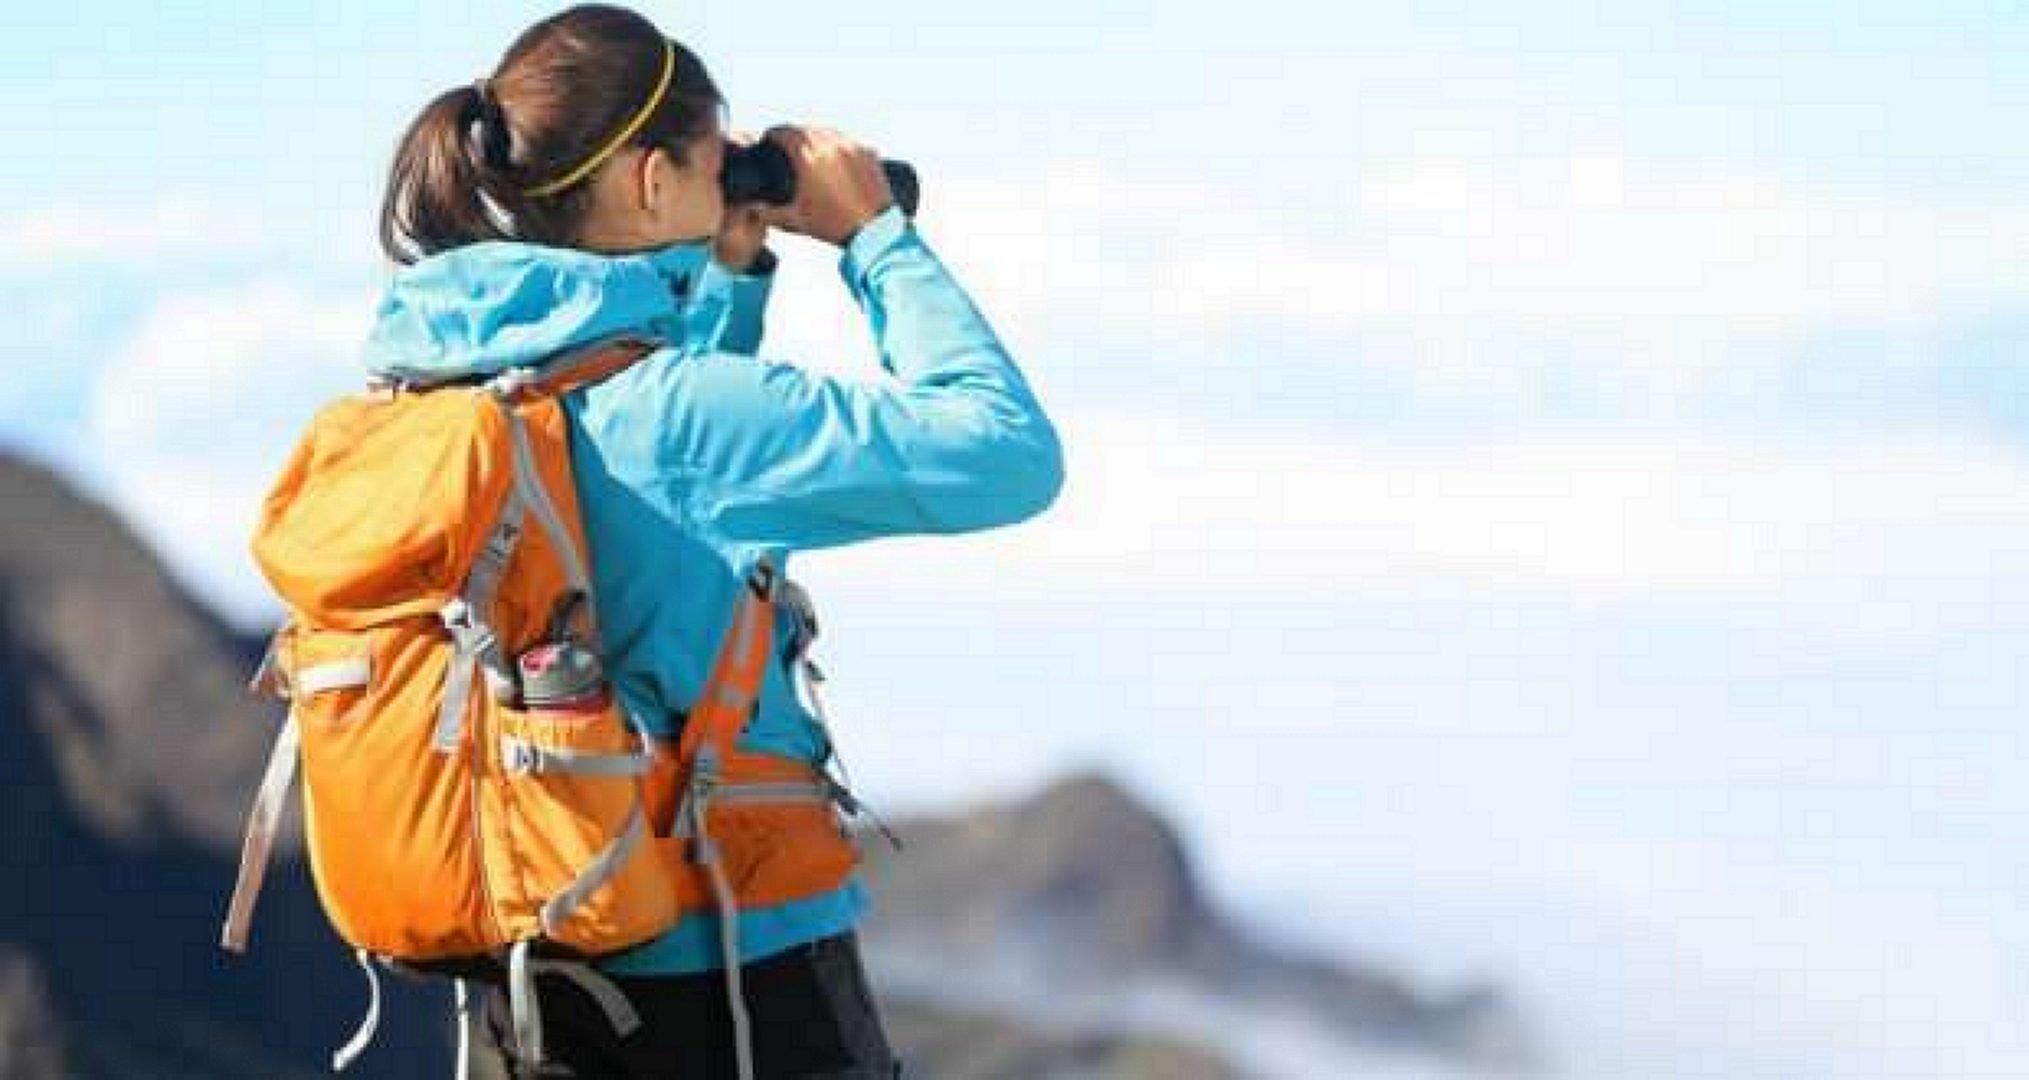 Girl in the mountains looks through binoculars